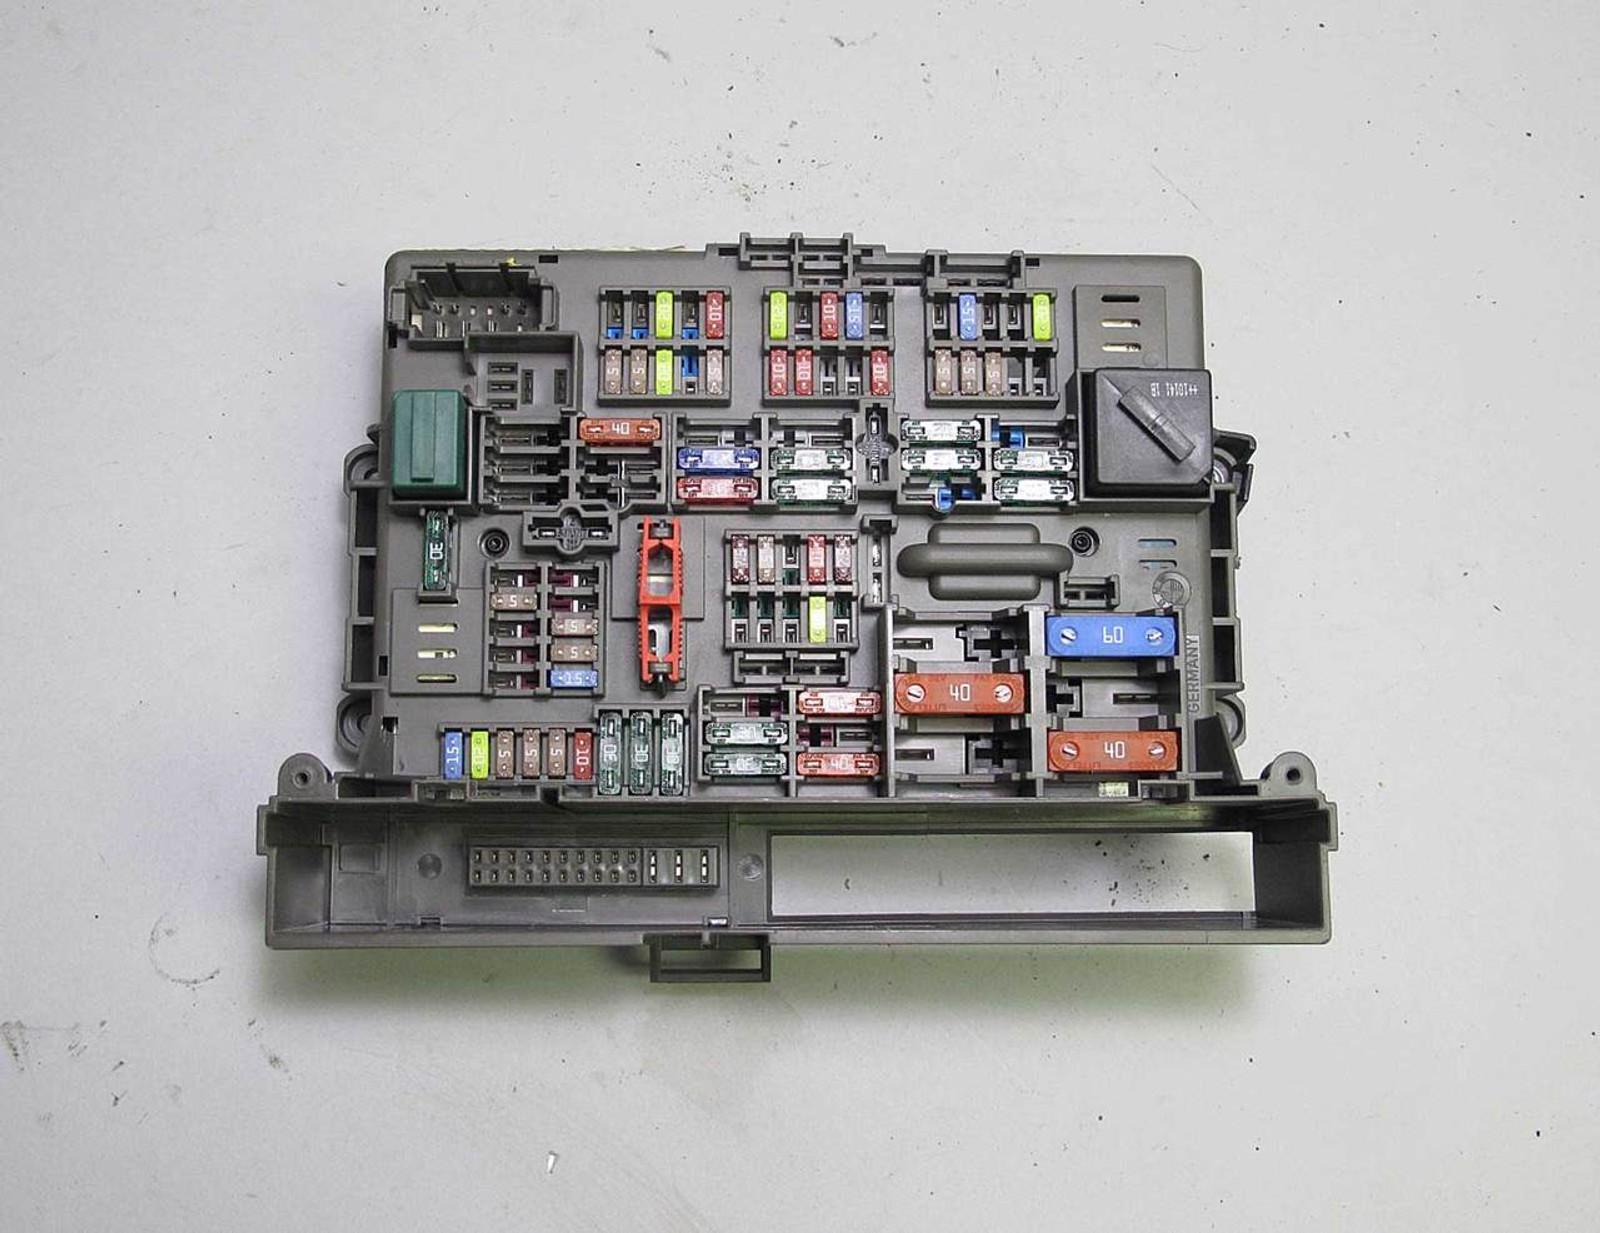 hight resolution of bmw e90 fuse box recall wiring diagram dat bmw 1 series recall fuse box bmw fuse box recall